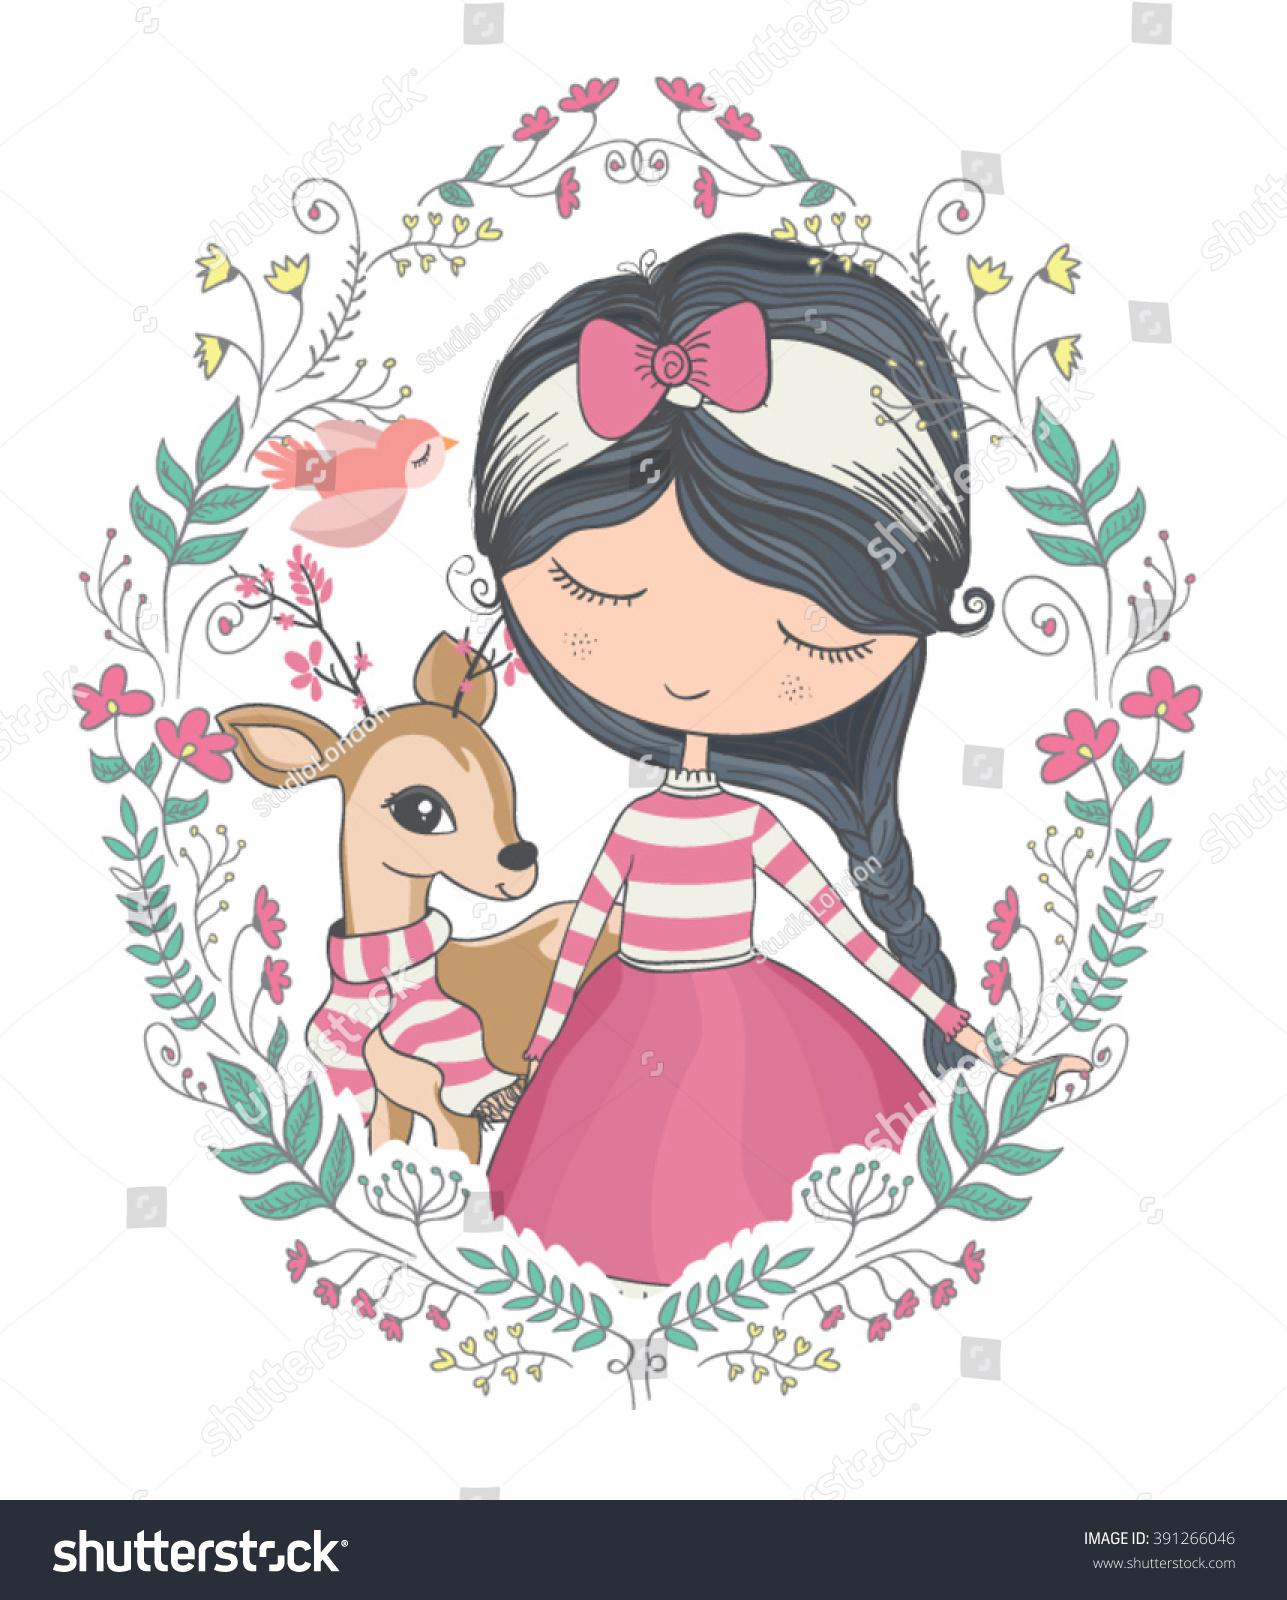 http://image.shutterstock.com/z/stock-vector-girl-vector-t-shirt-print-dear-vector-animal-pattern-animal-vector-cute-girl-vector-book-391266046.jpg Girl